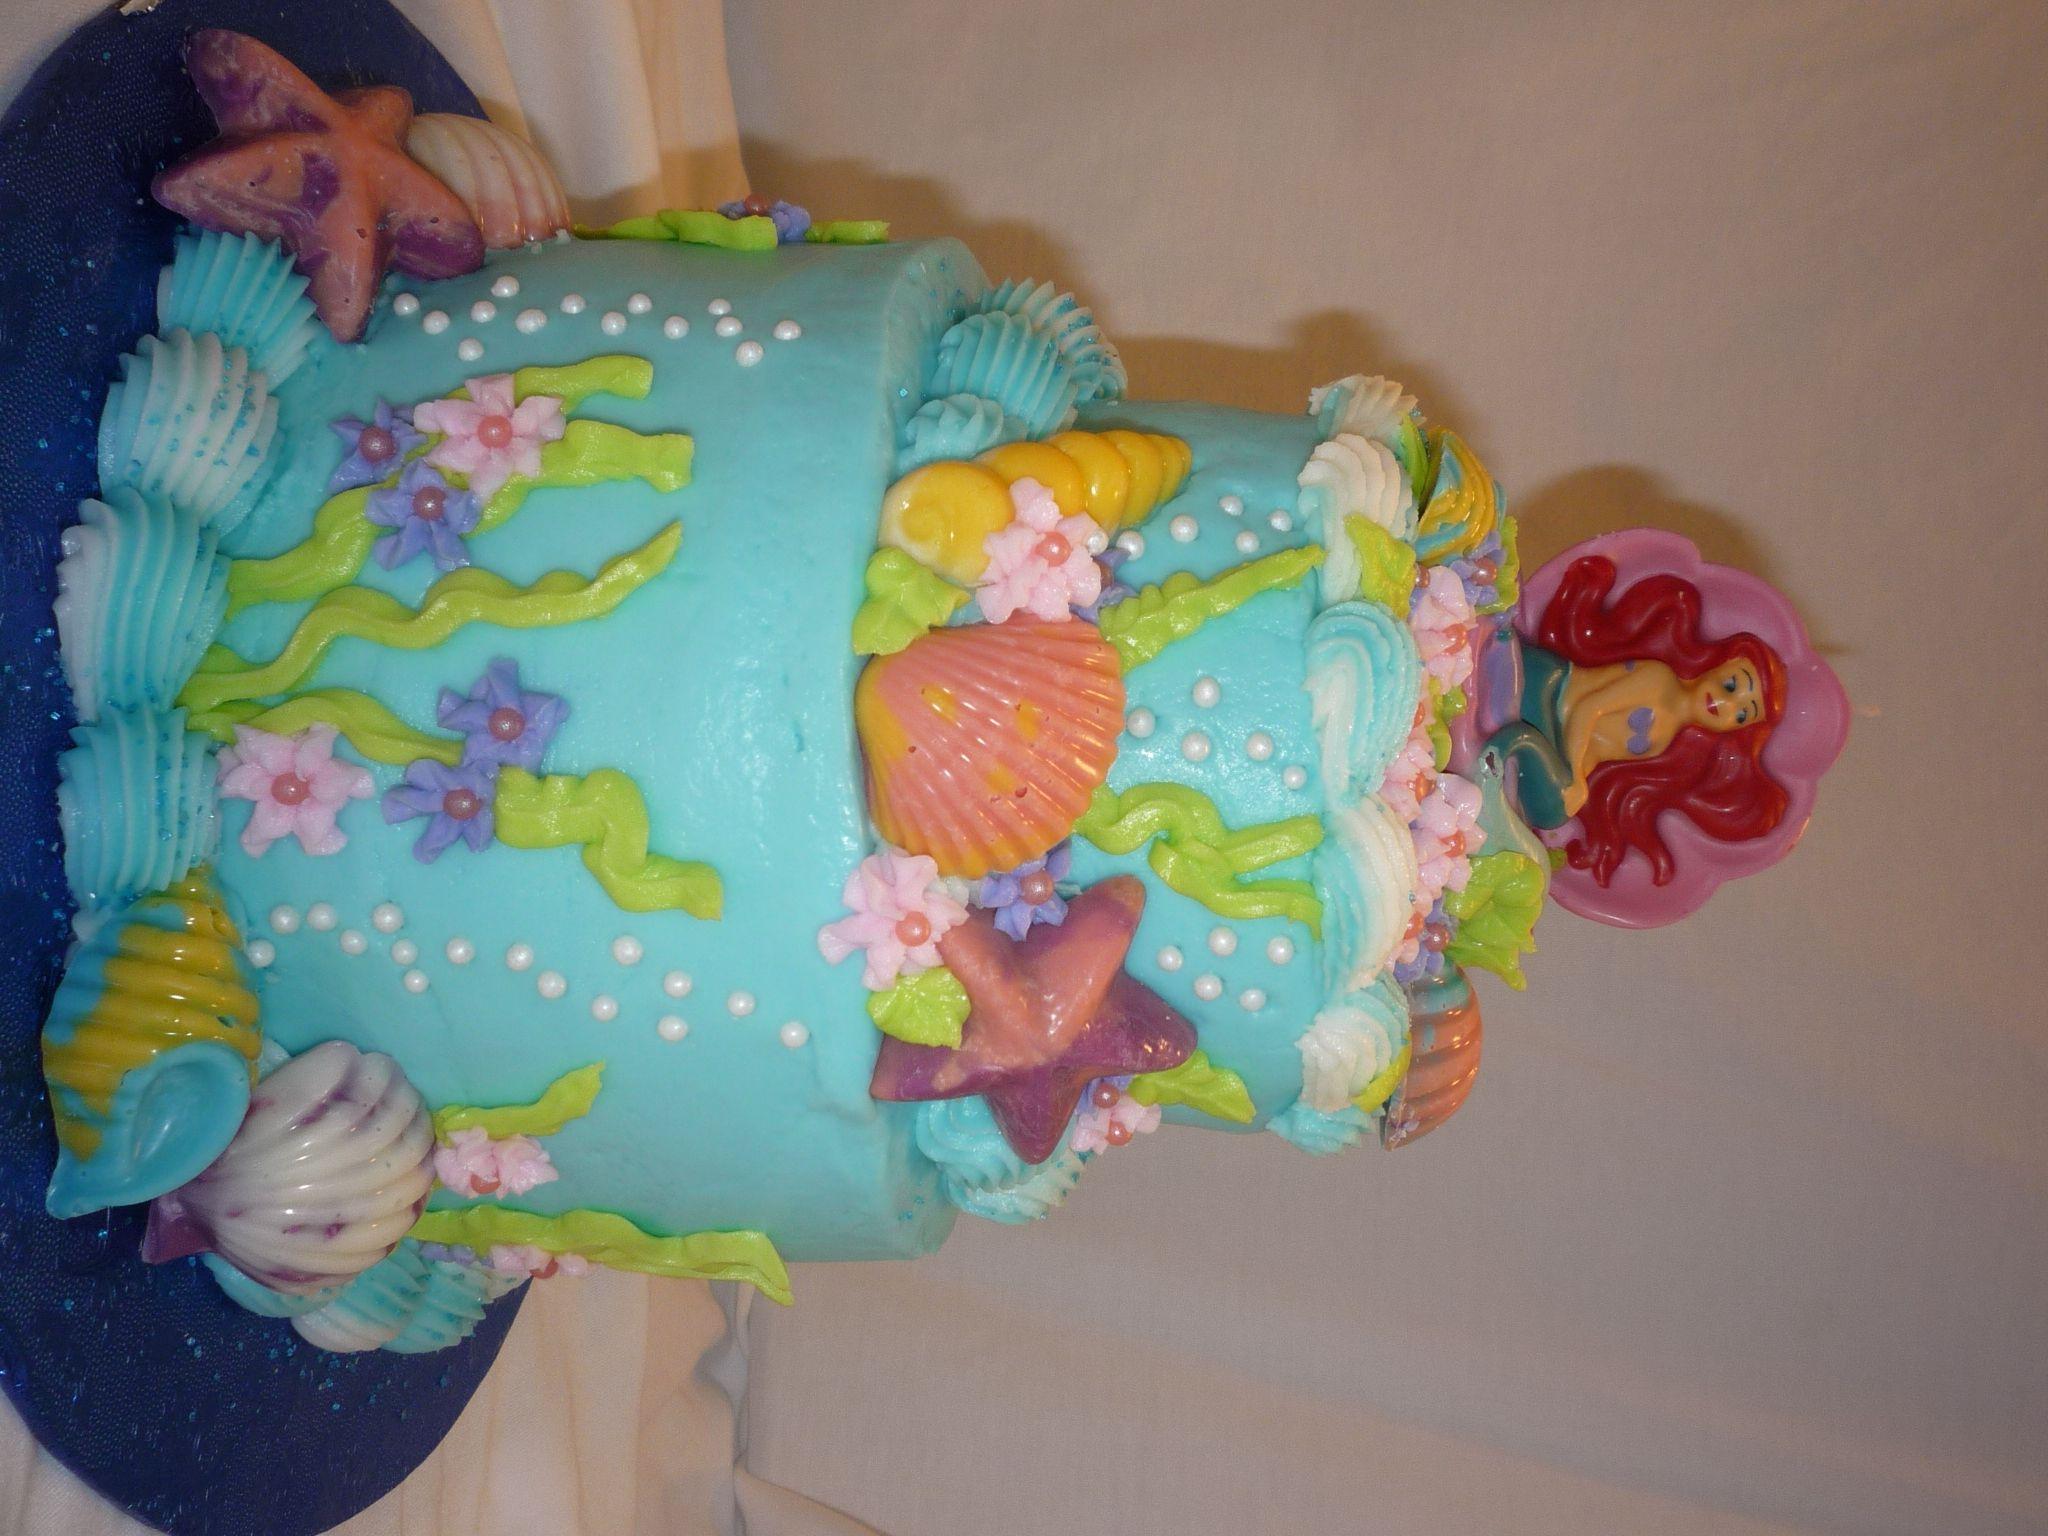 ariel birthday cakes at walmart Little Mermaid Birthday Cake